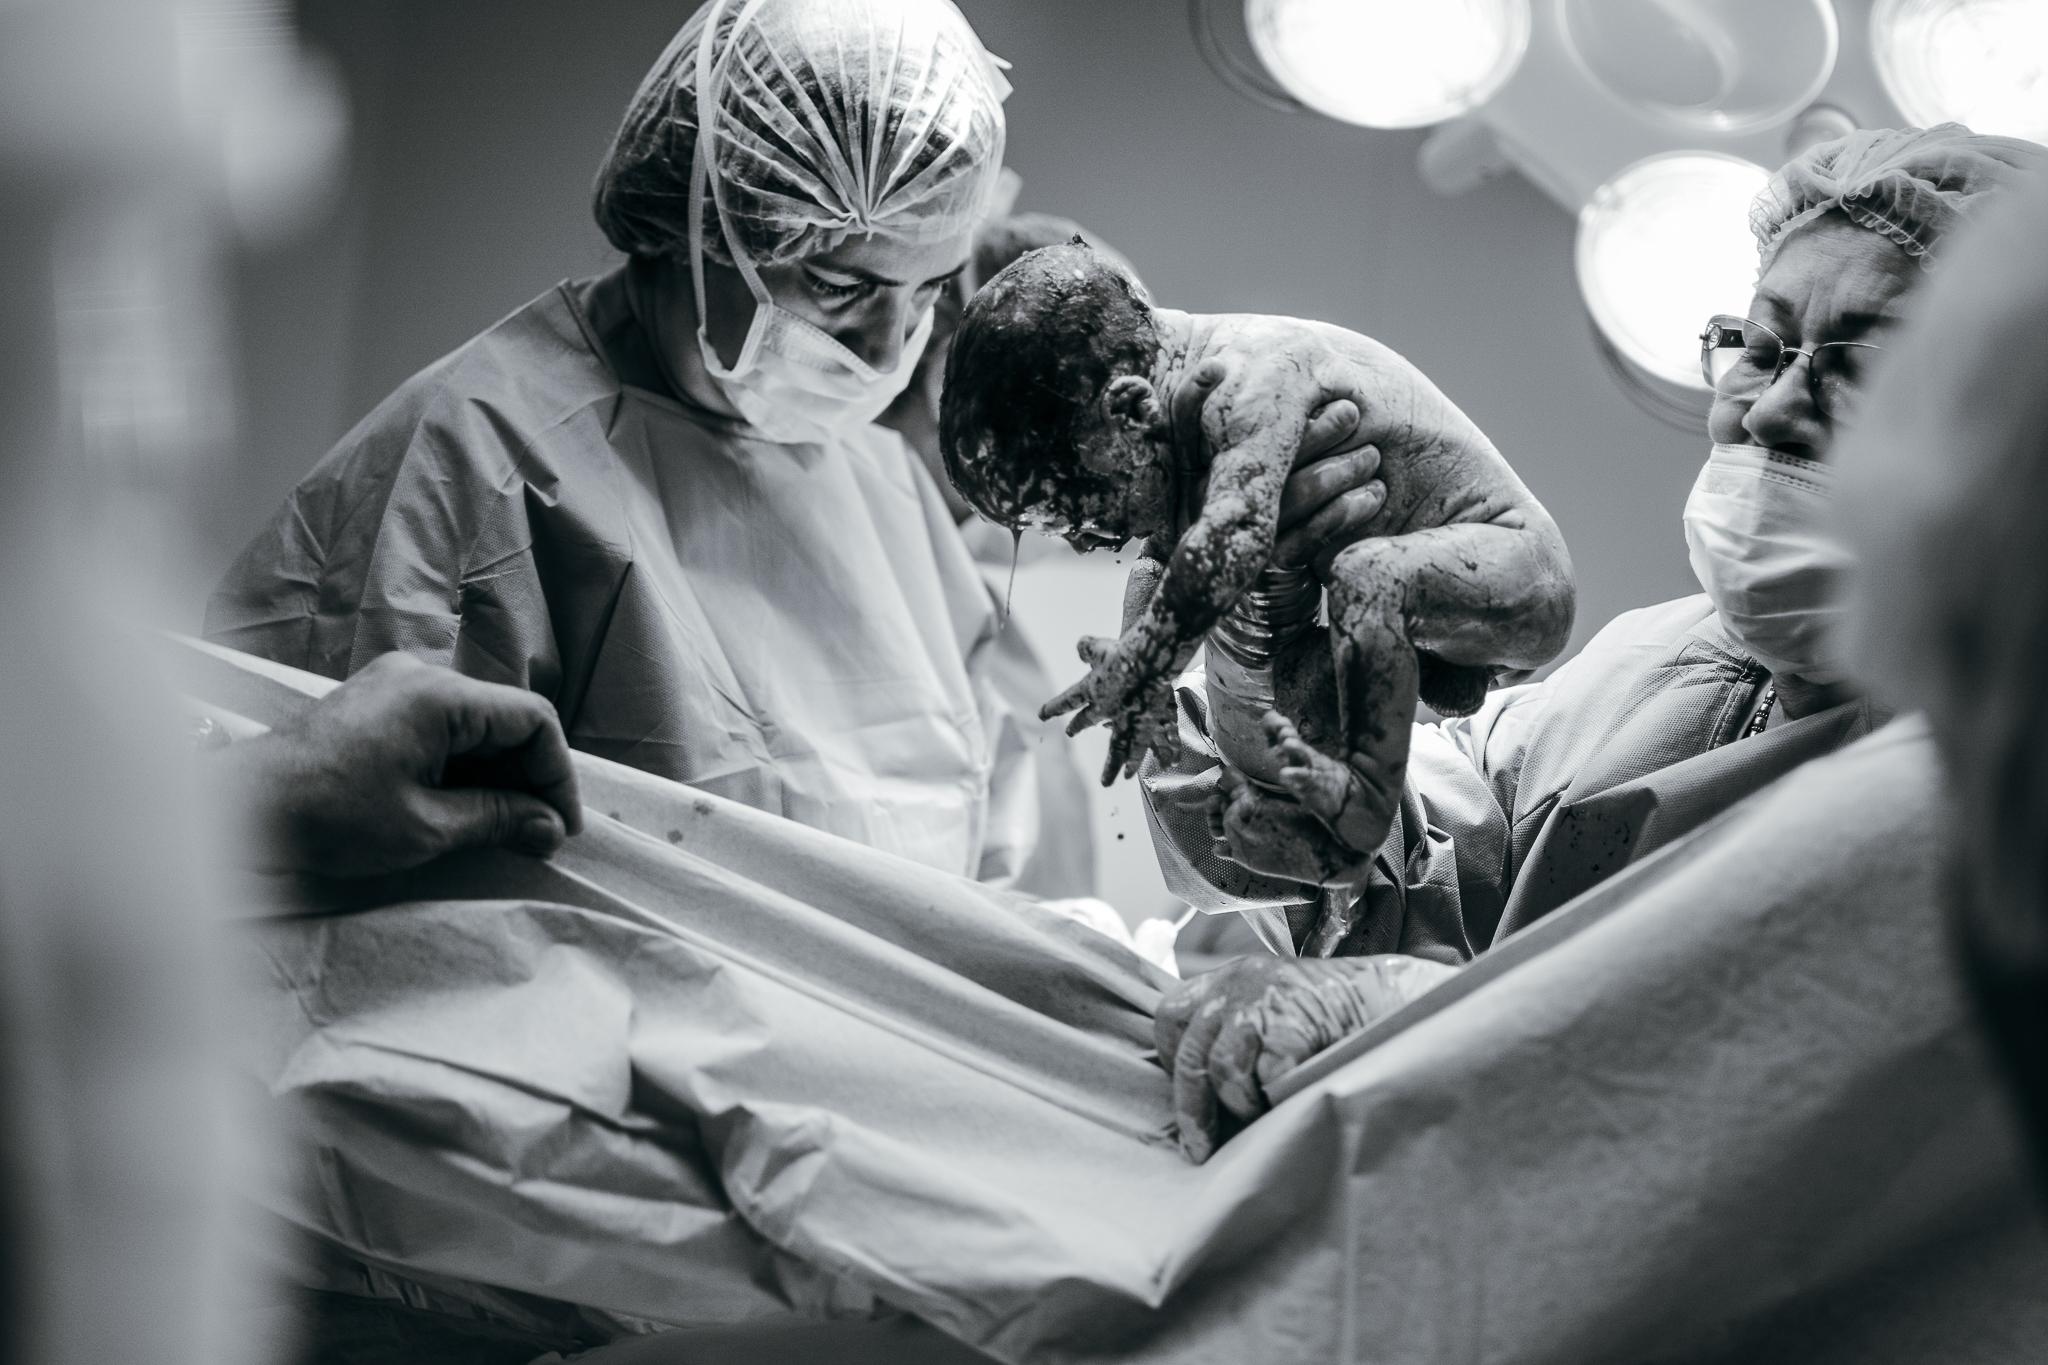 Lana Photographs Dubai Birth Photographer doctors delivering baby via csection inside operating room at Mediclinic City Hospital in Dubai